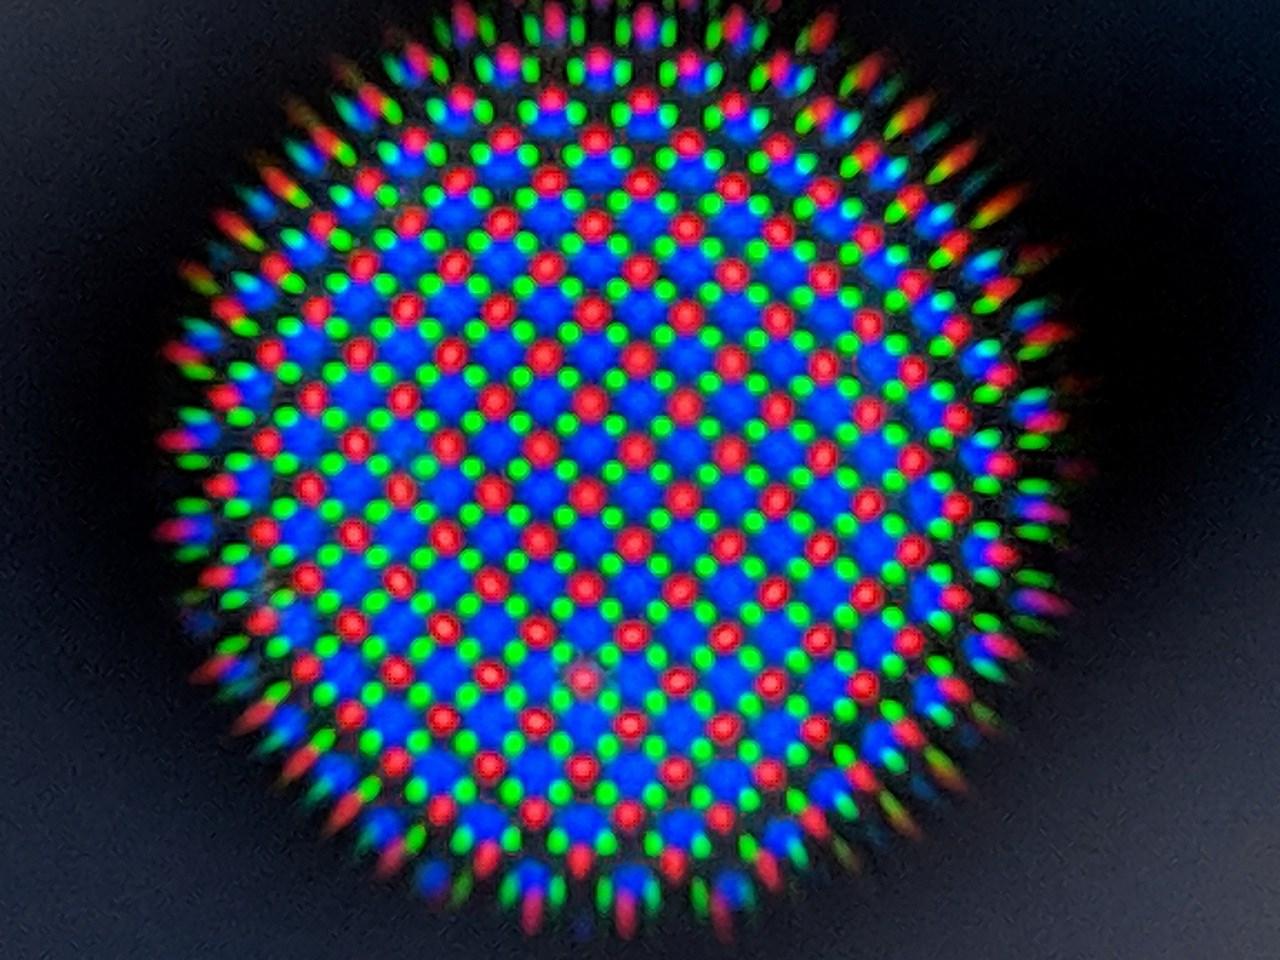 Xperia XZ3 OLED